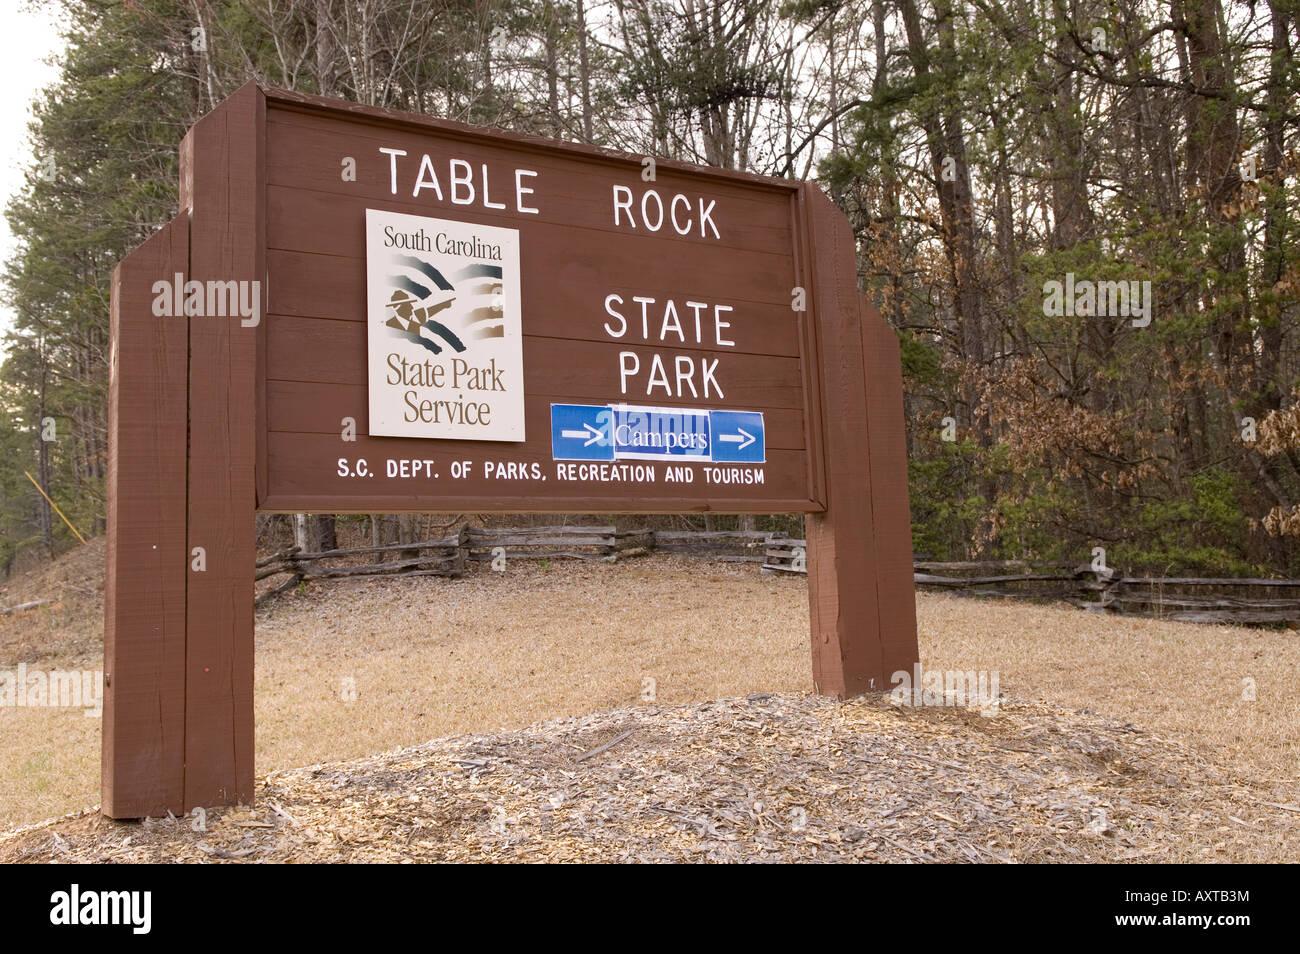 Table Rock State Park Entrance Sign Upstate South Carolina USA